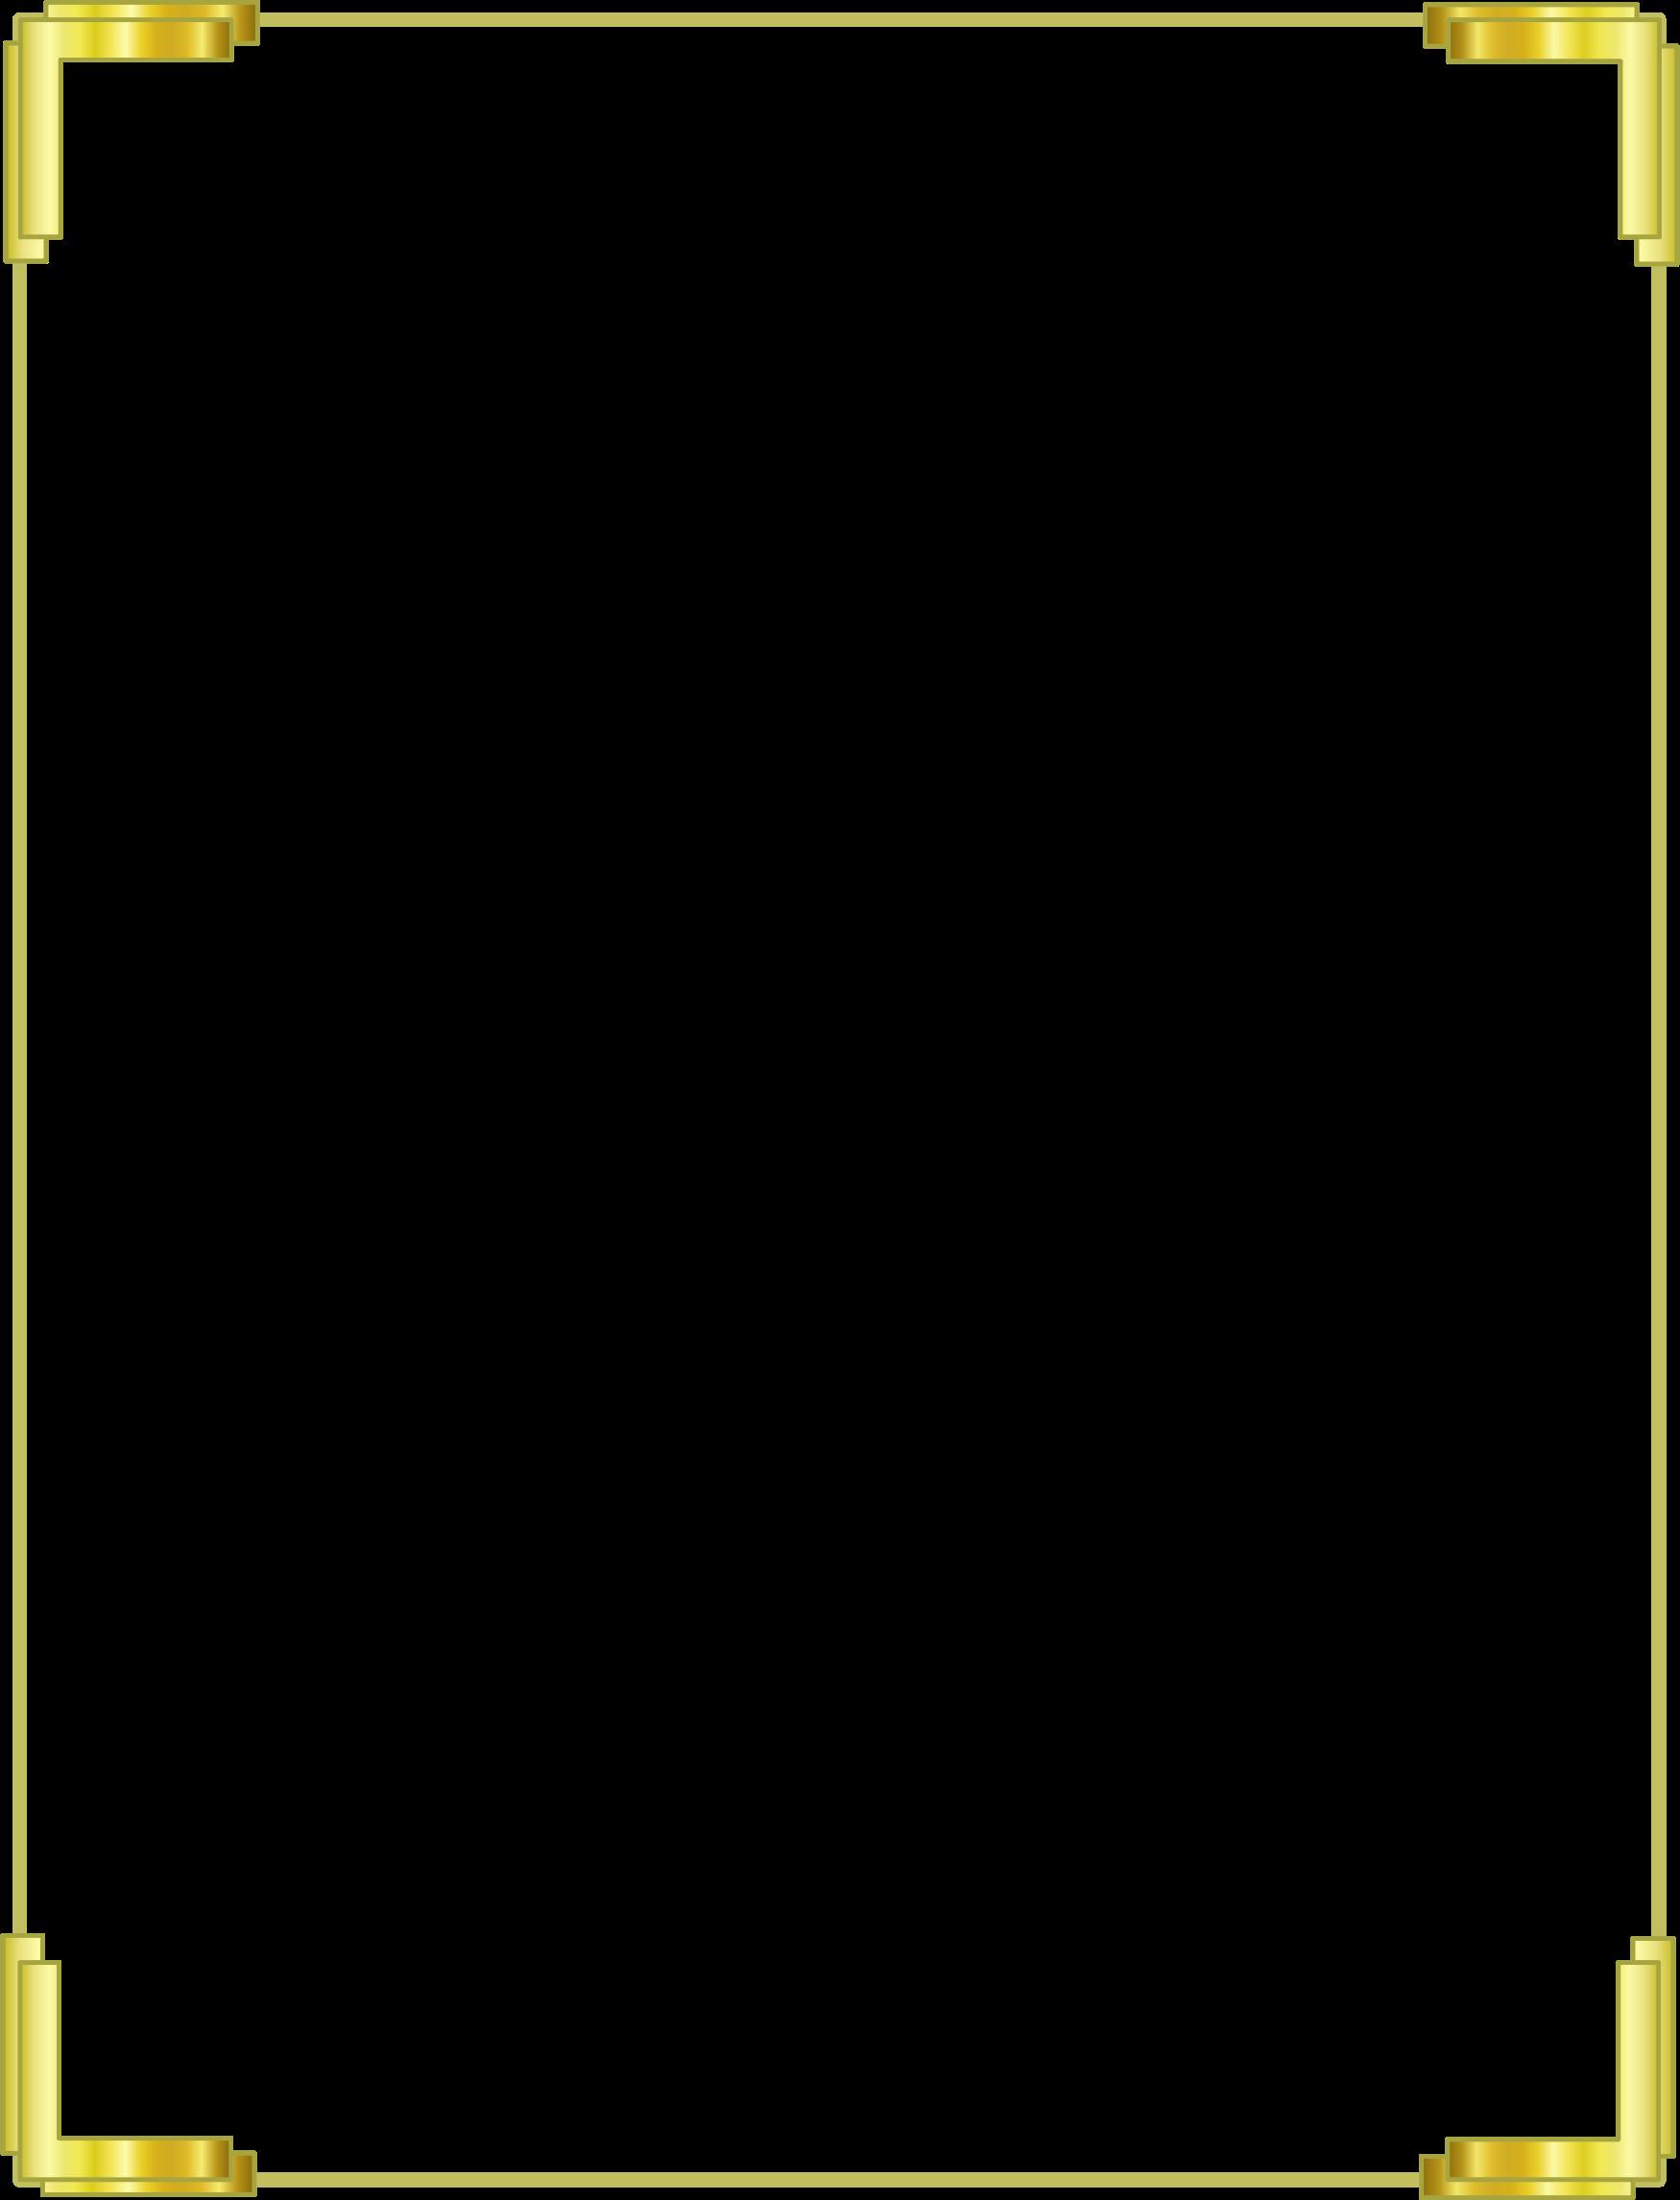 download gold border frame free download hq png image scroll border clipart for macs scroll frame clip art